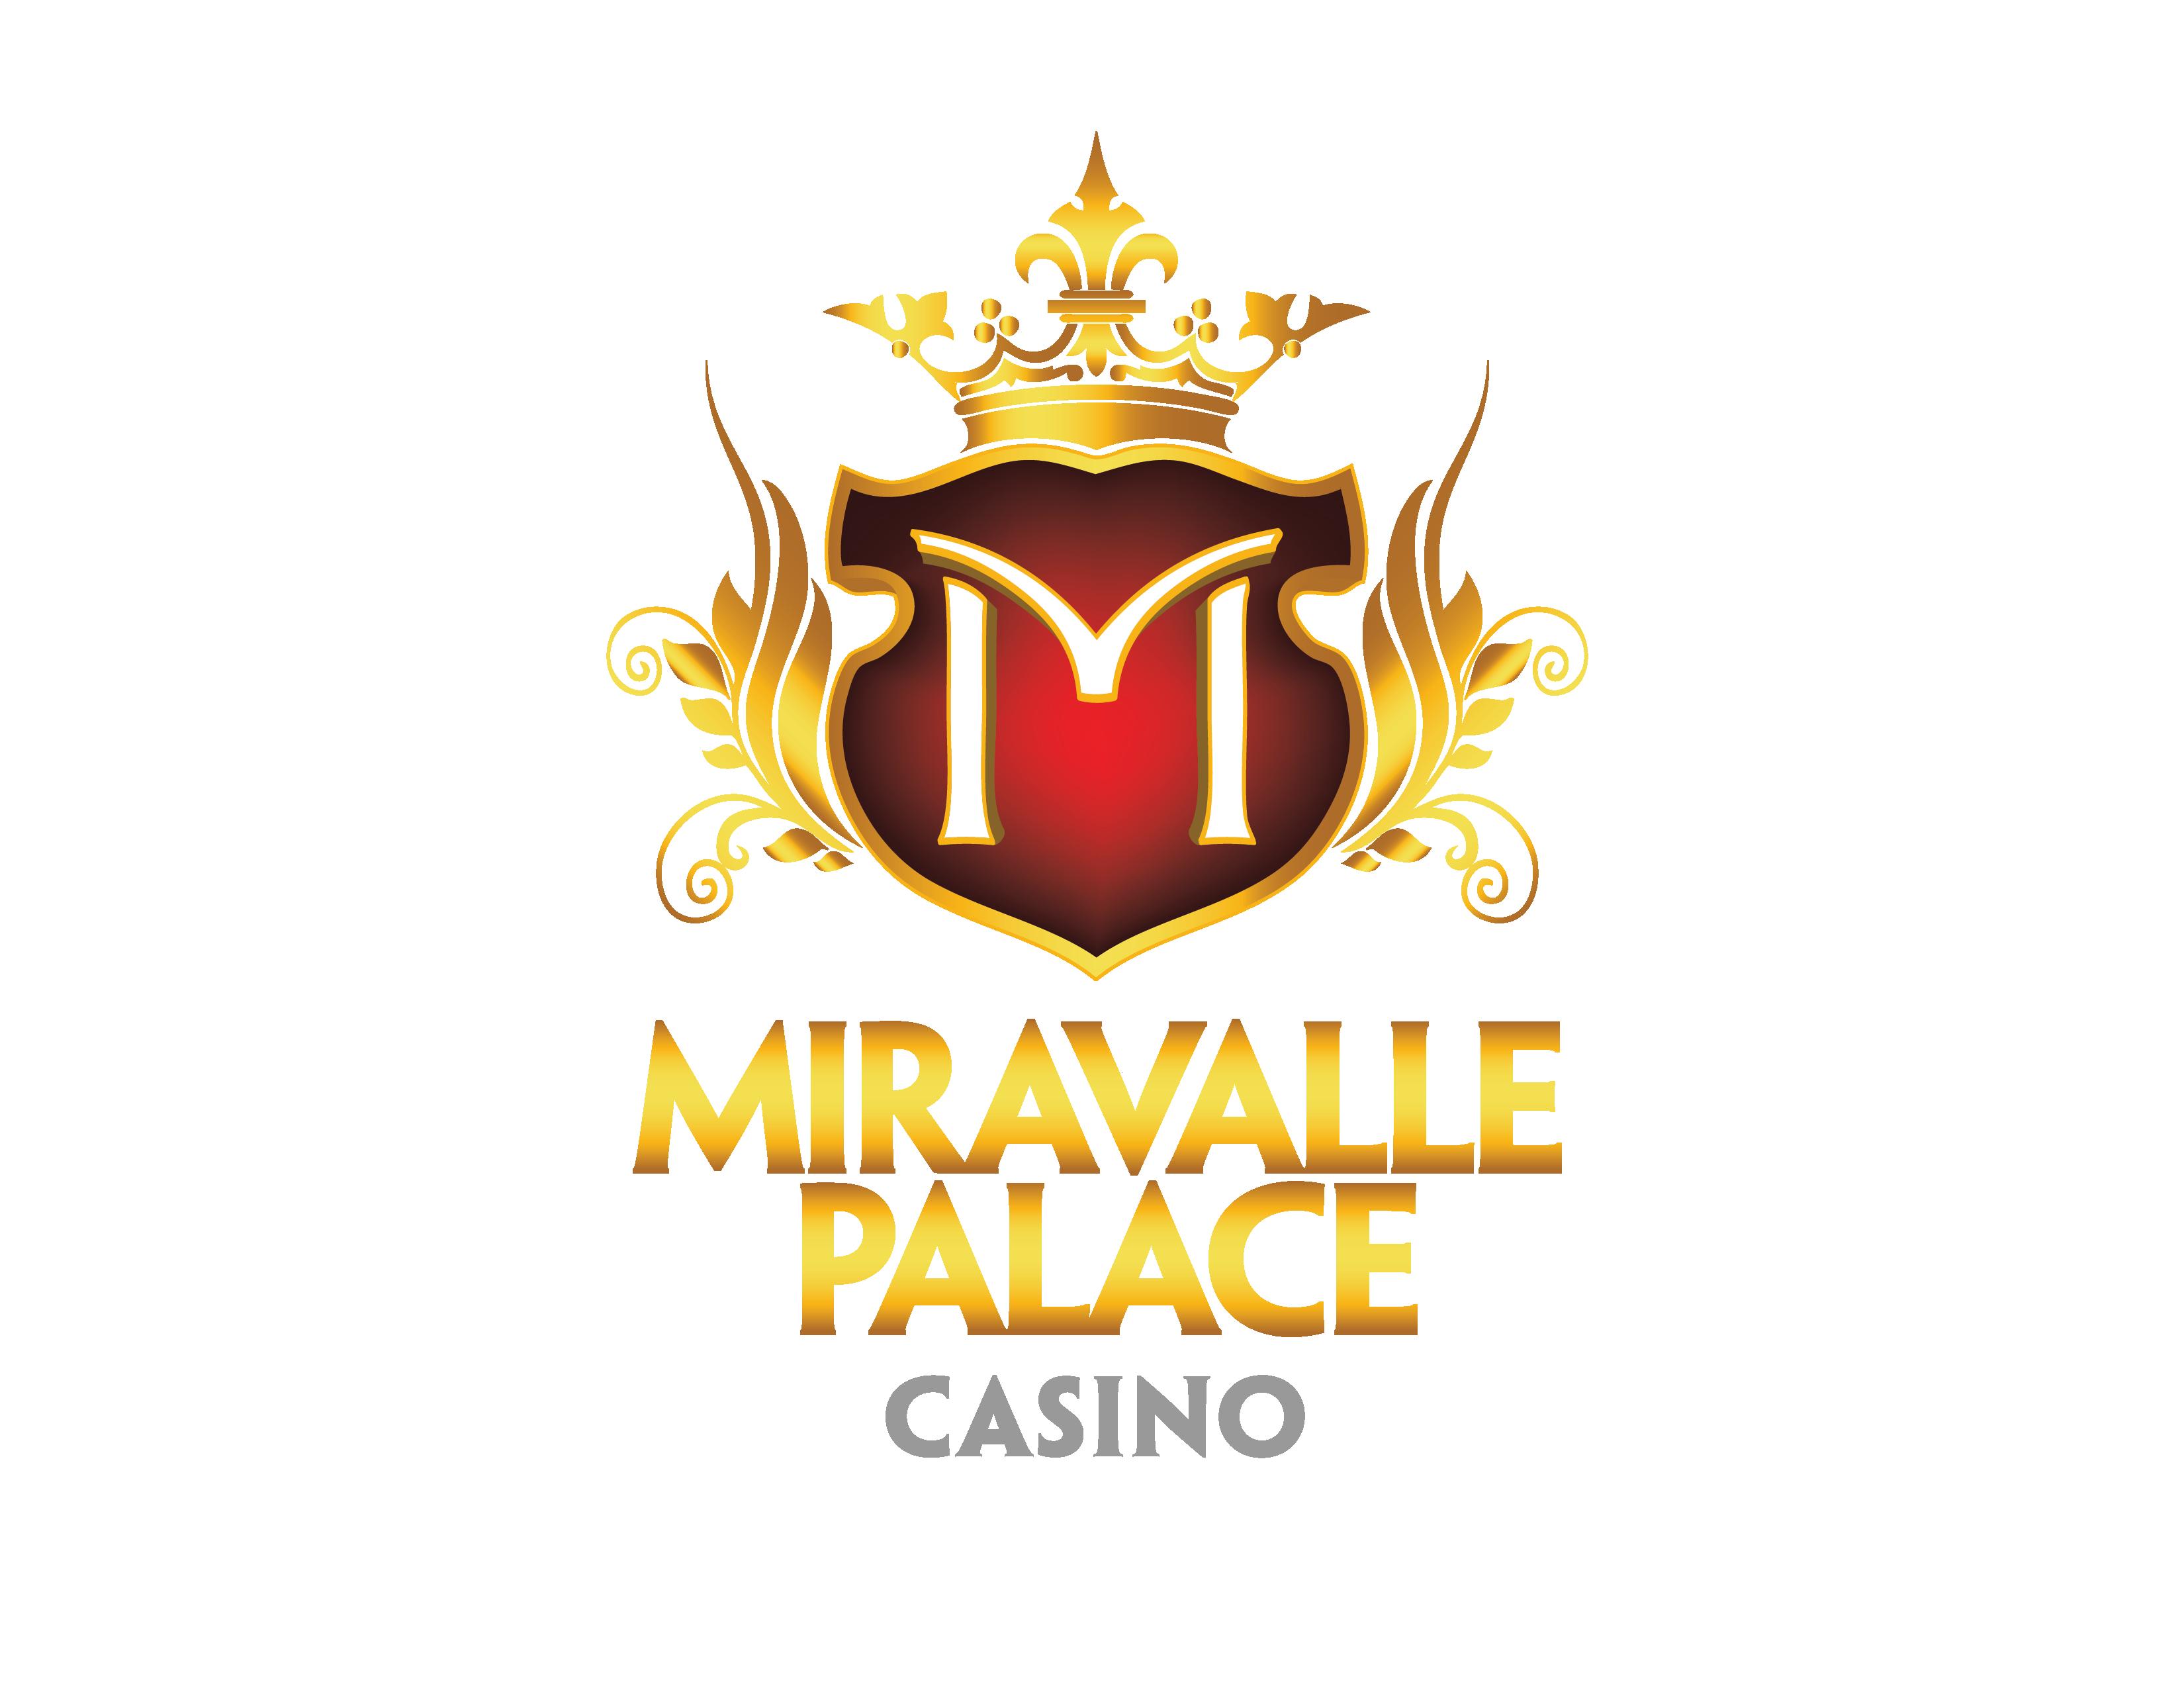 Casino miravalle.com french lick indiana casinos